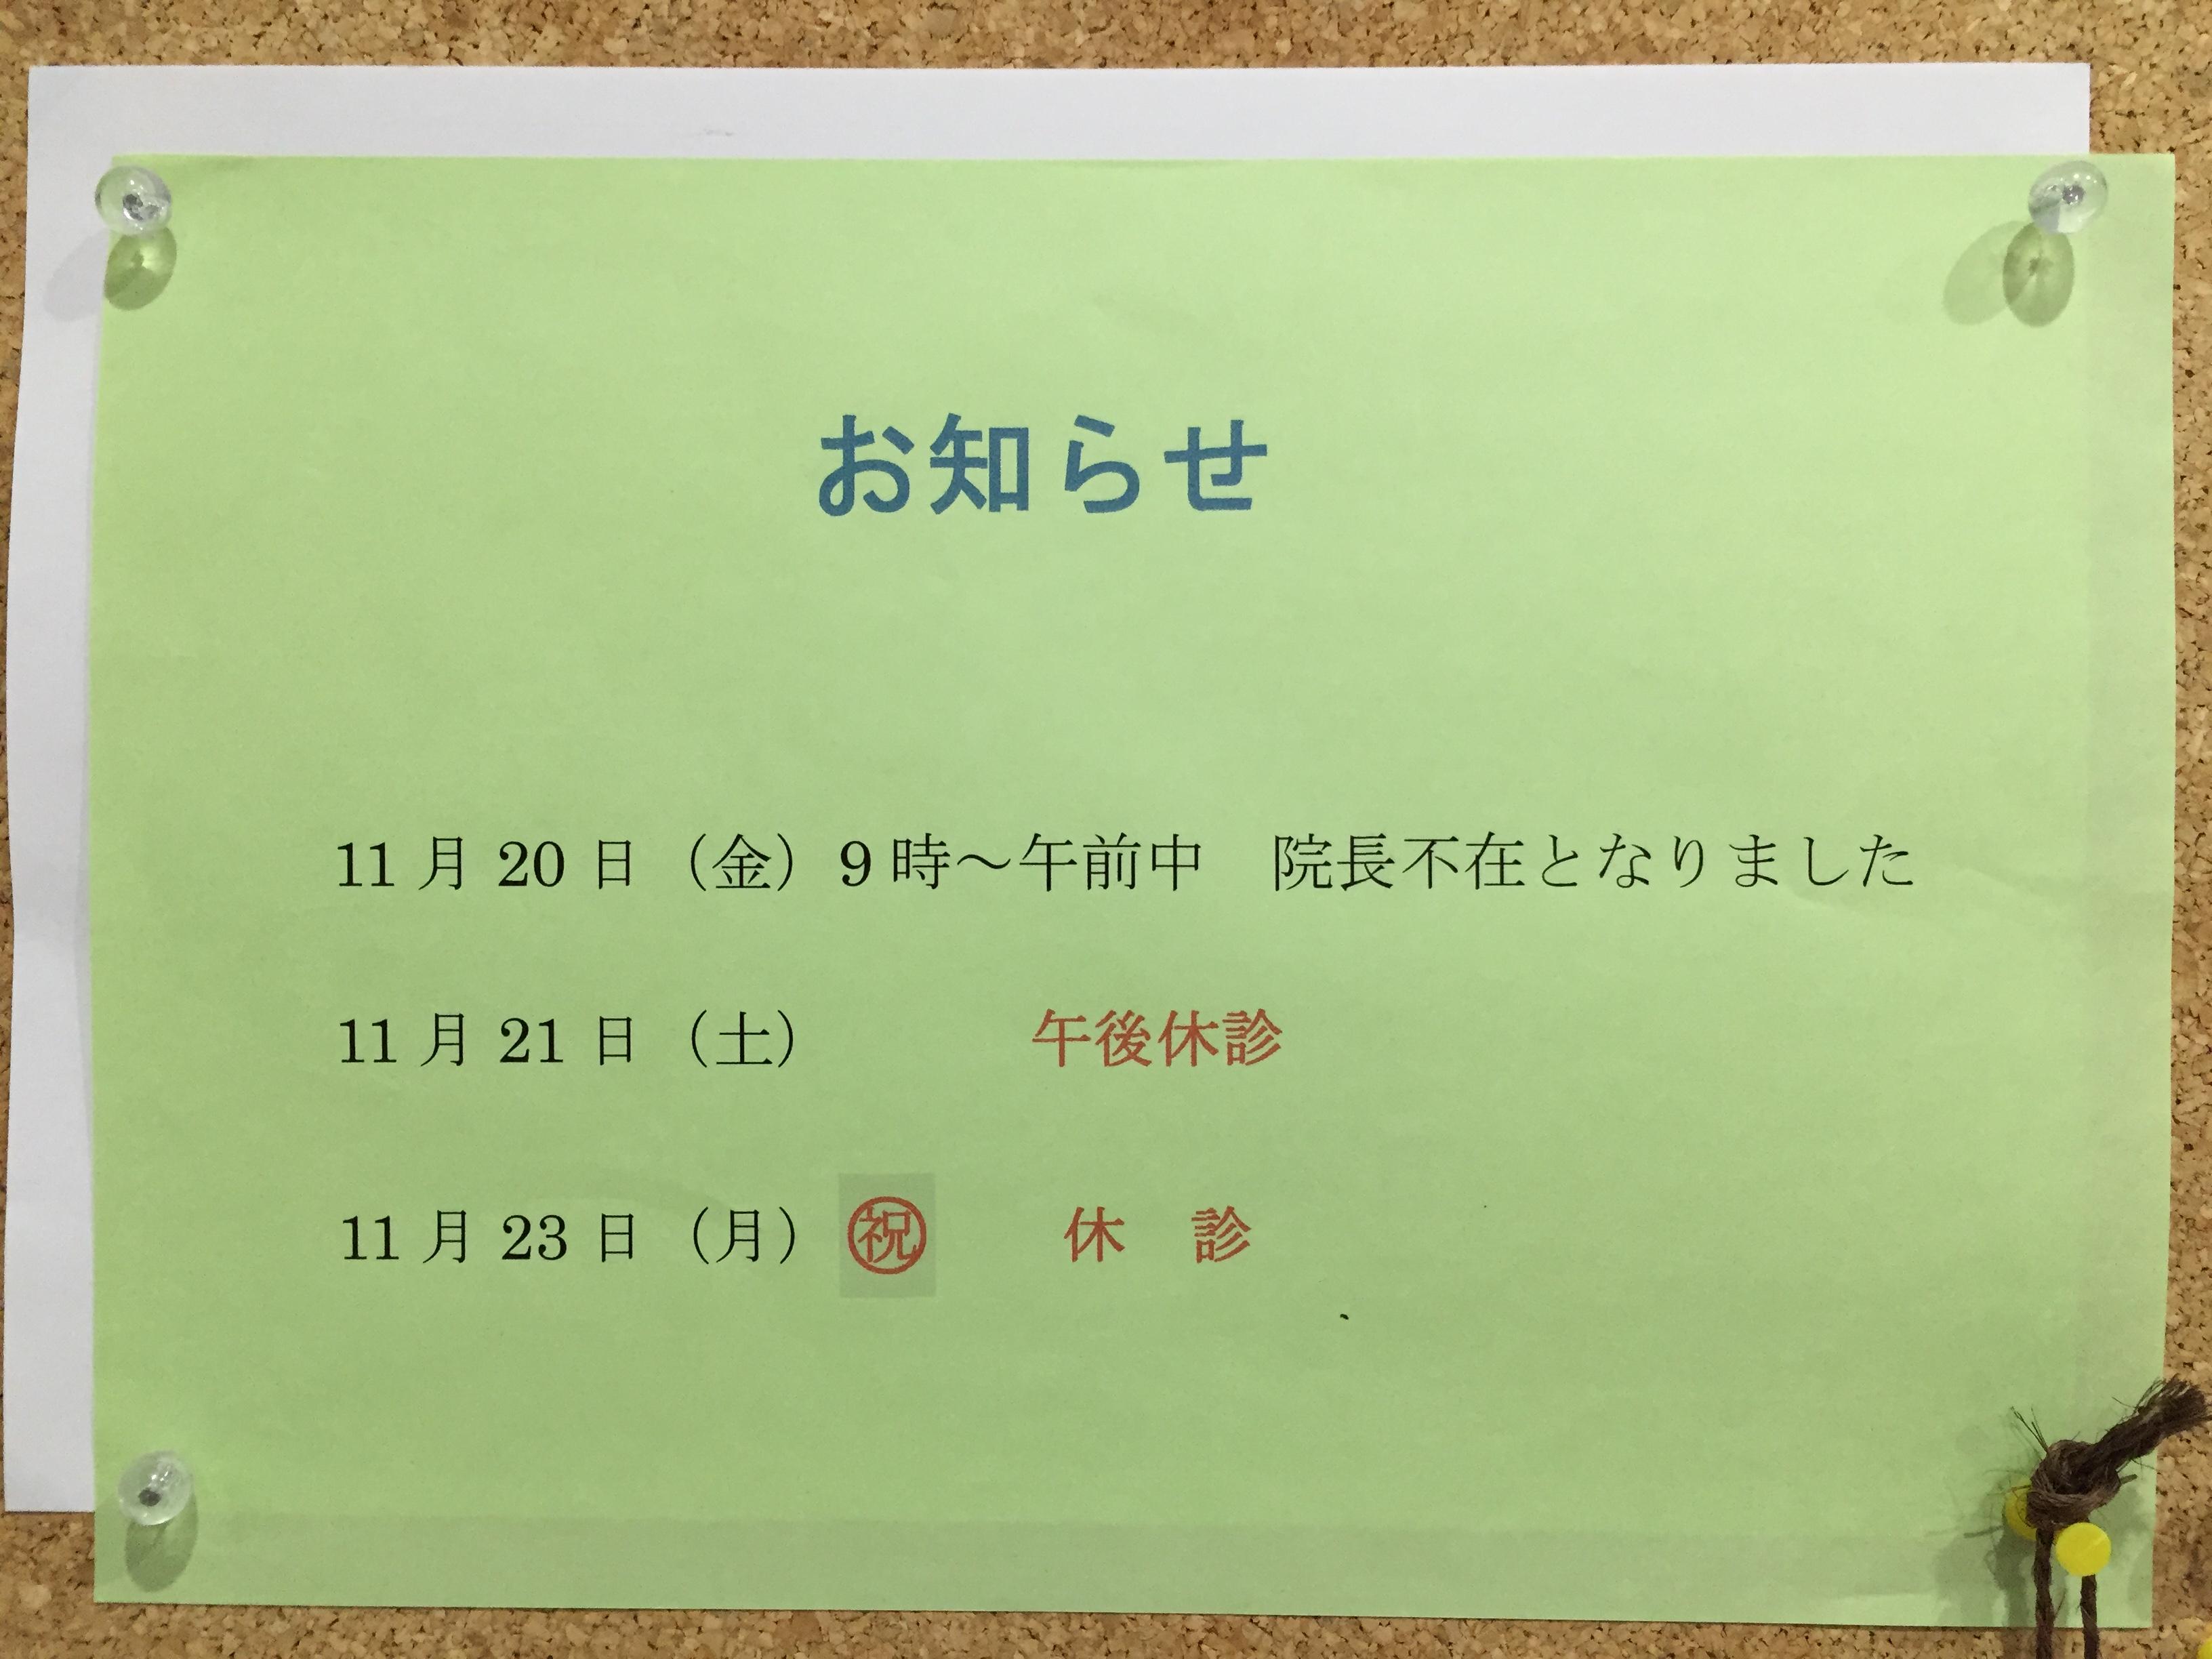 http://hashiguchi-seikotu.com/blog/about/%EF%BC%92%EF%BC%90%EF%BC%91%EF%BC%95.11.18.JPG